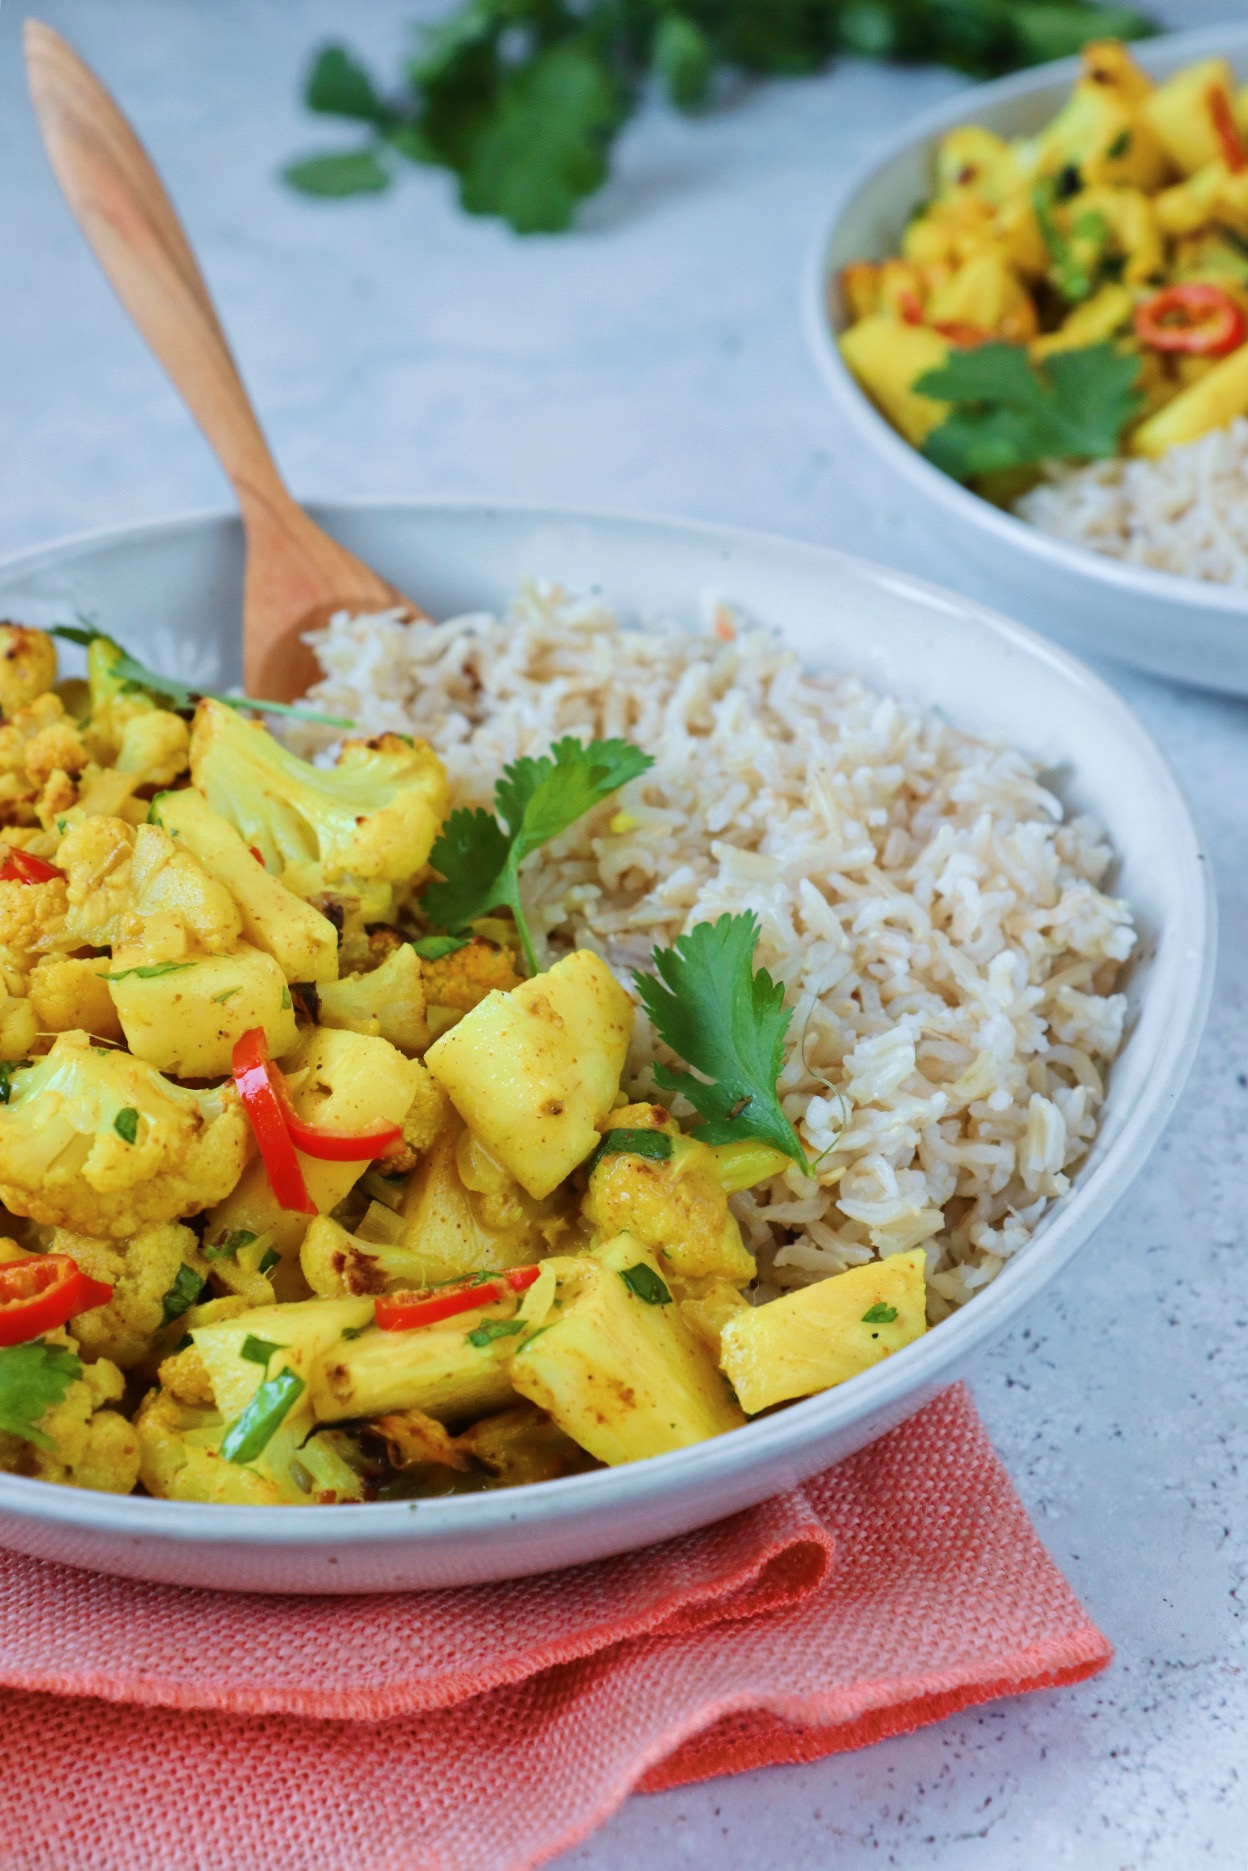 Bloemkool ananas curry www.jaimyskitchen.nl